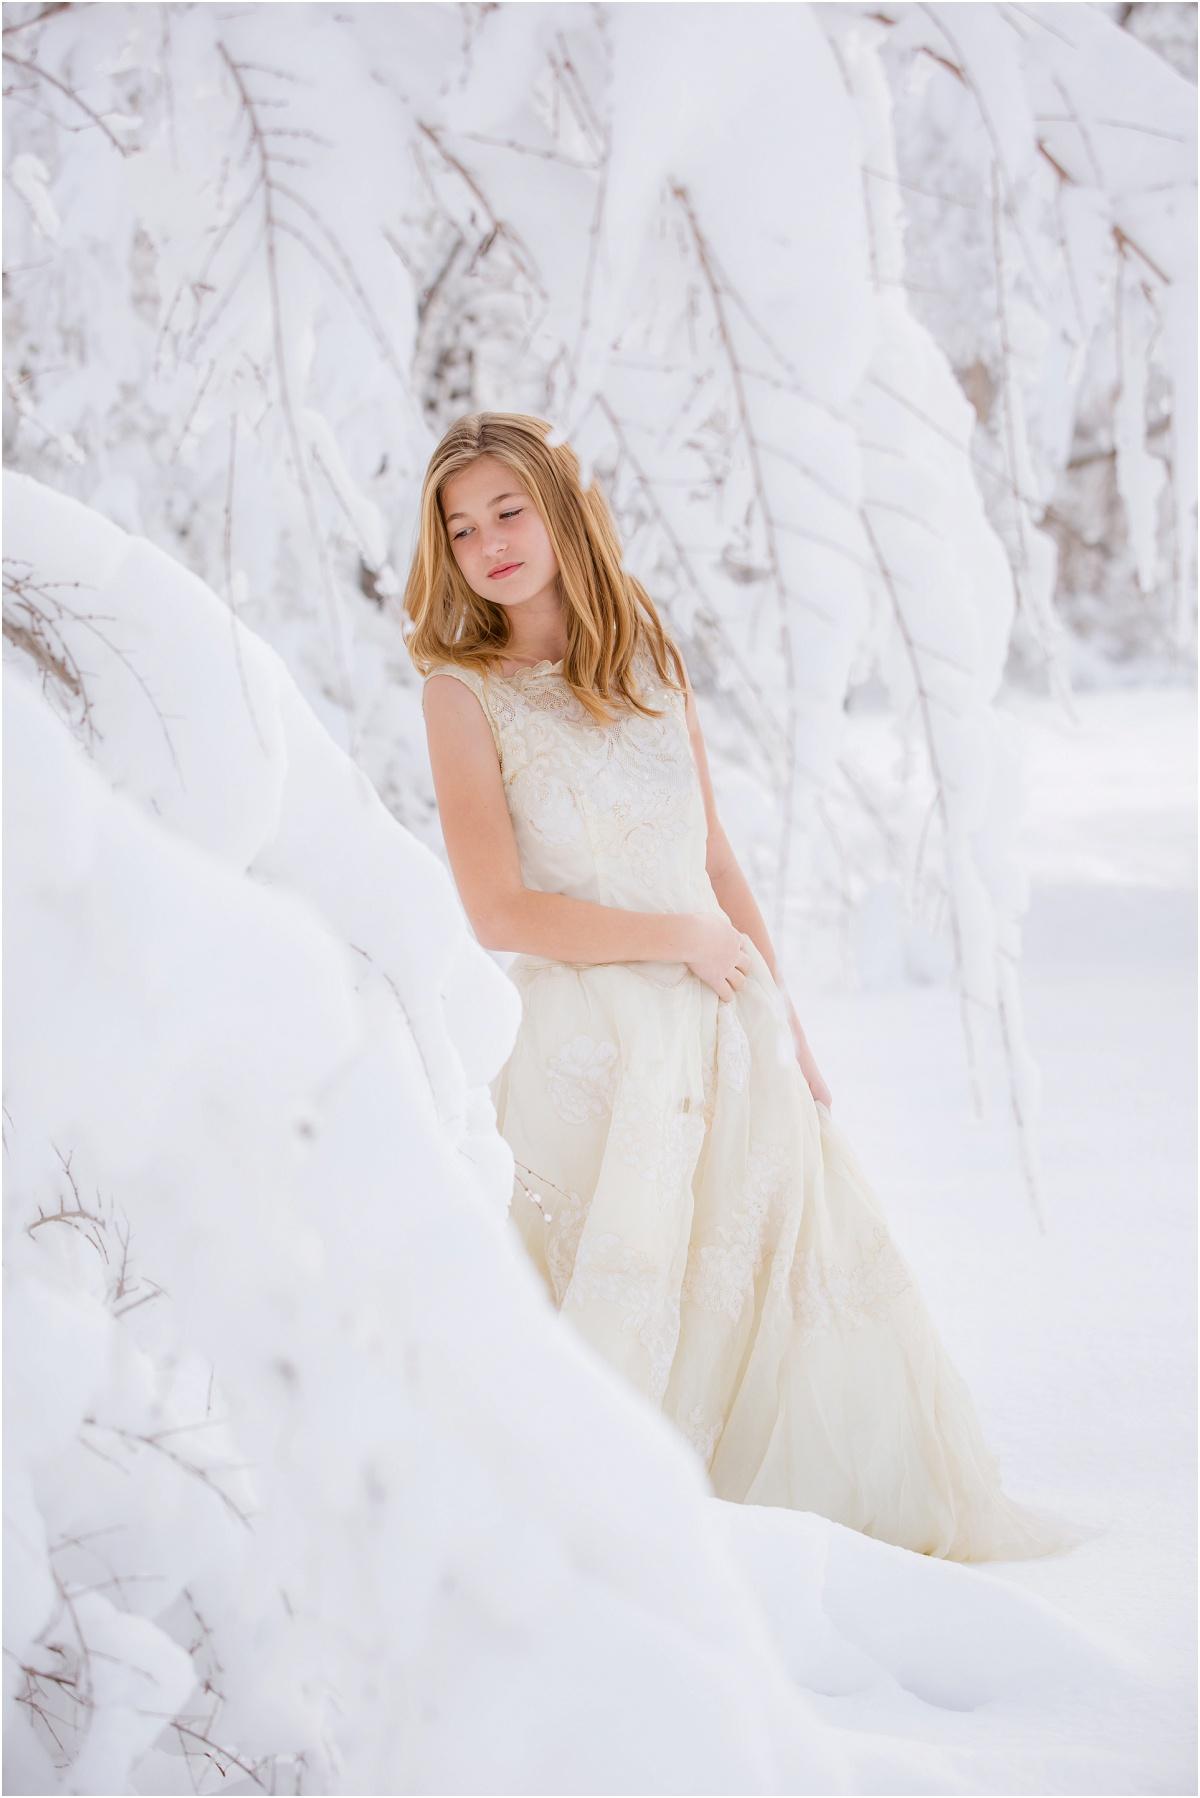 Snow Princess Winter Shoot Terra Cooper Photography_5047.jpg